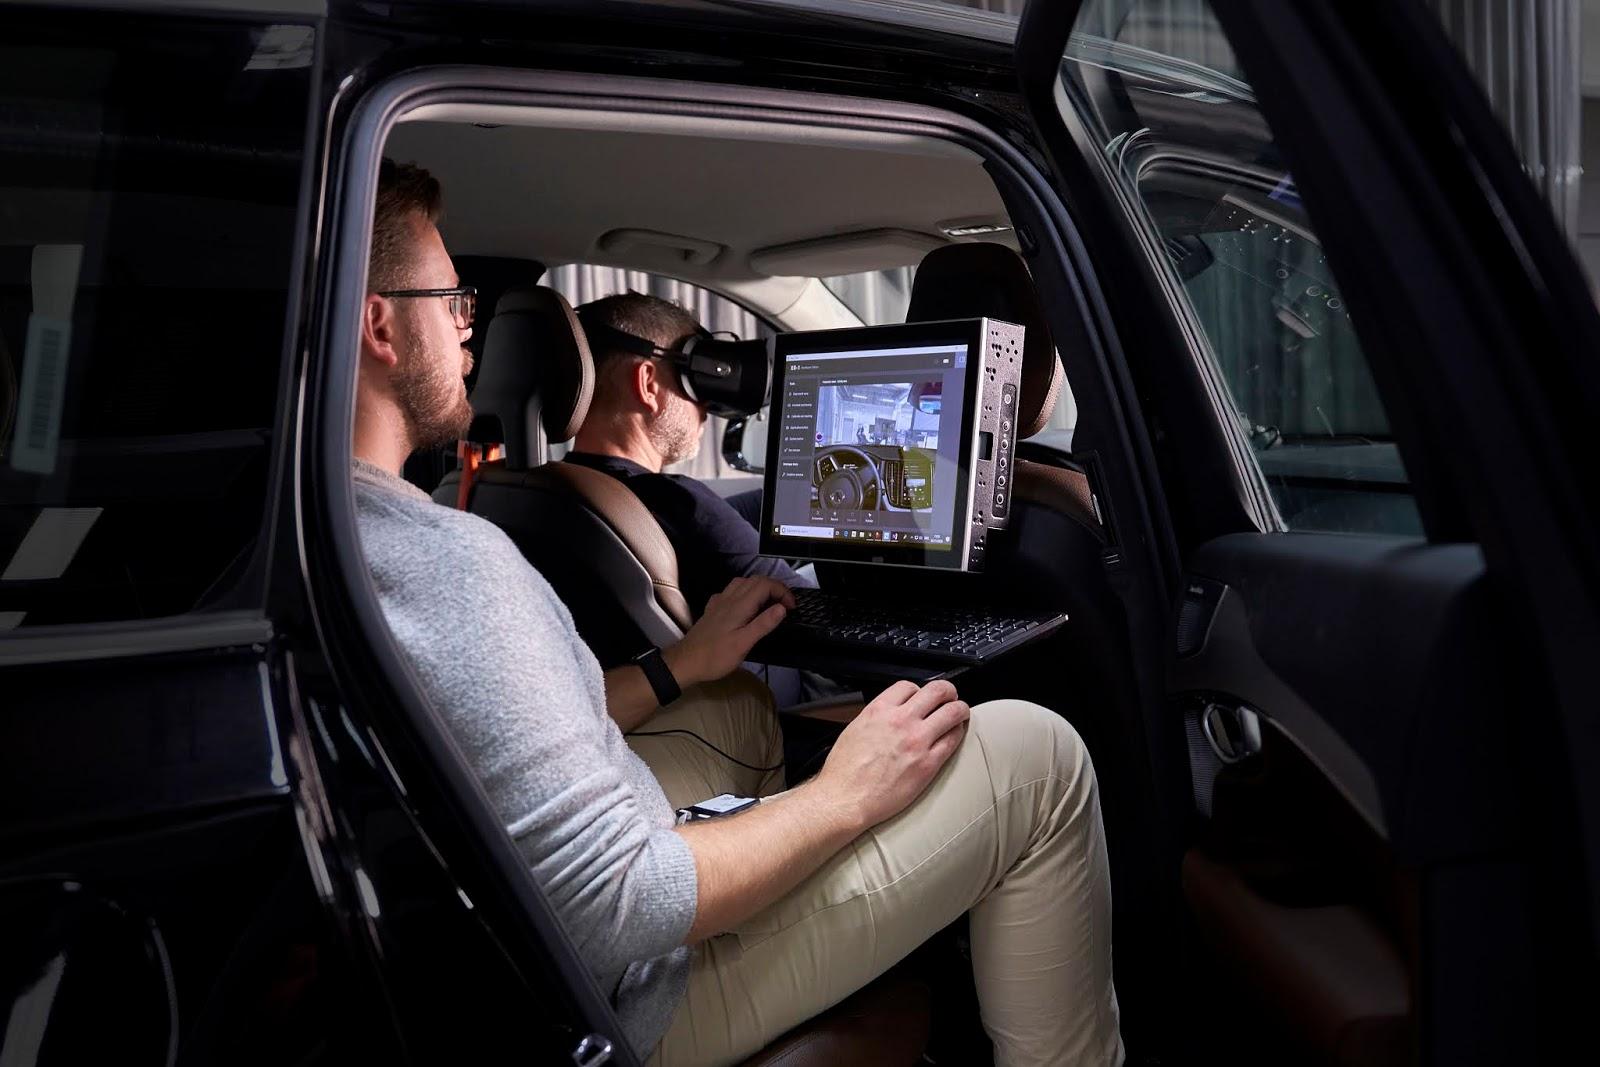 Volvo2BCars2Buses2Bgaming2Btechnology2Bto2Bdevelop2Bsafer2Bcars2B05 H Volvo Cars χρησιμοποιεί το... gaming για την εξέλιξη ασφαλών αυτοκινήτων Volvo, zblog, ασφάλεια, ειδήσεις, καινοτομία